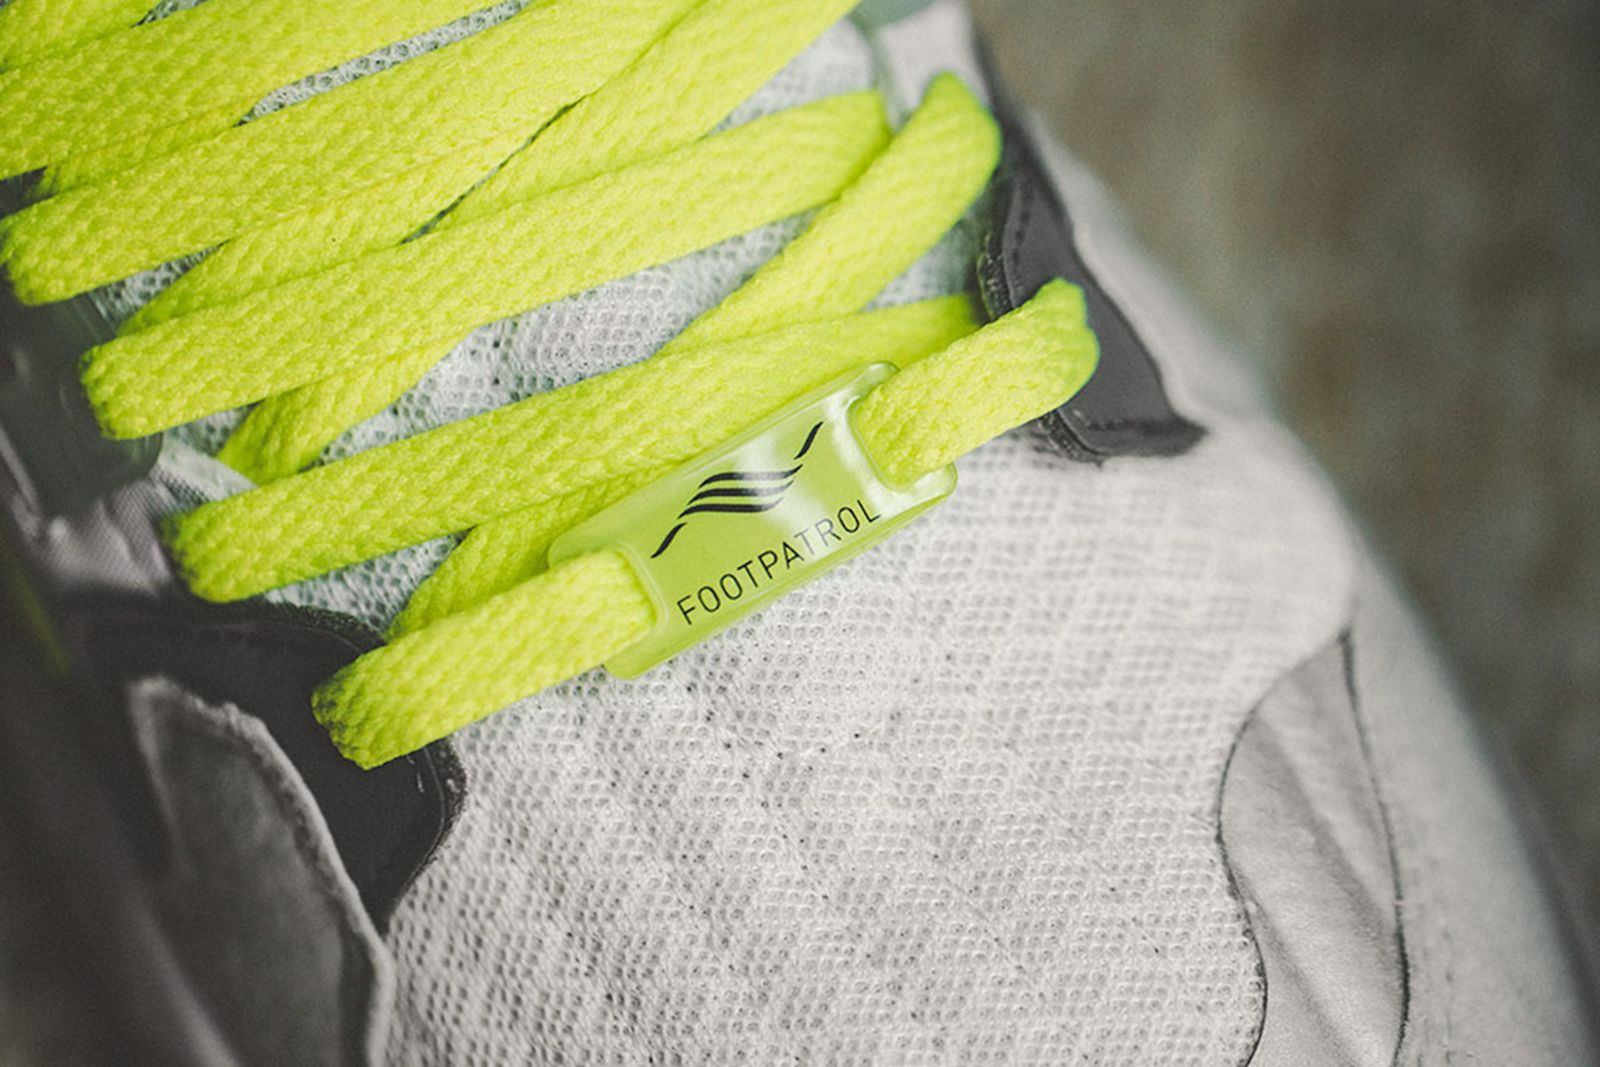 footpatrol adidas zx torsion release date price